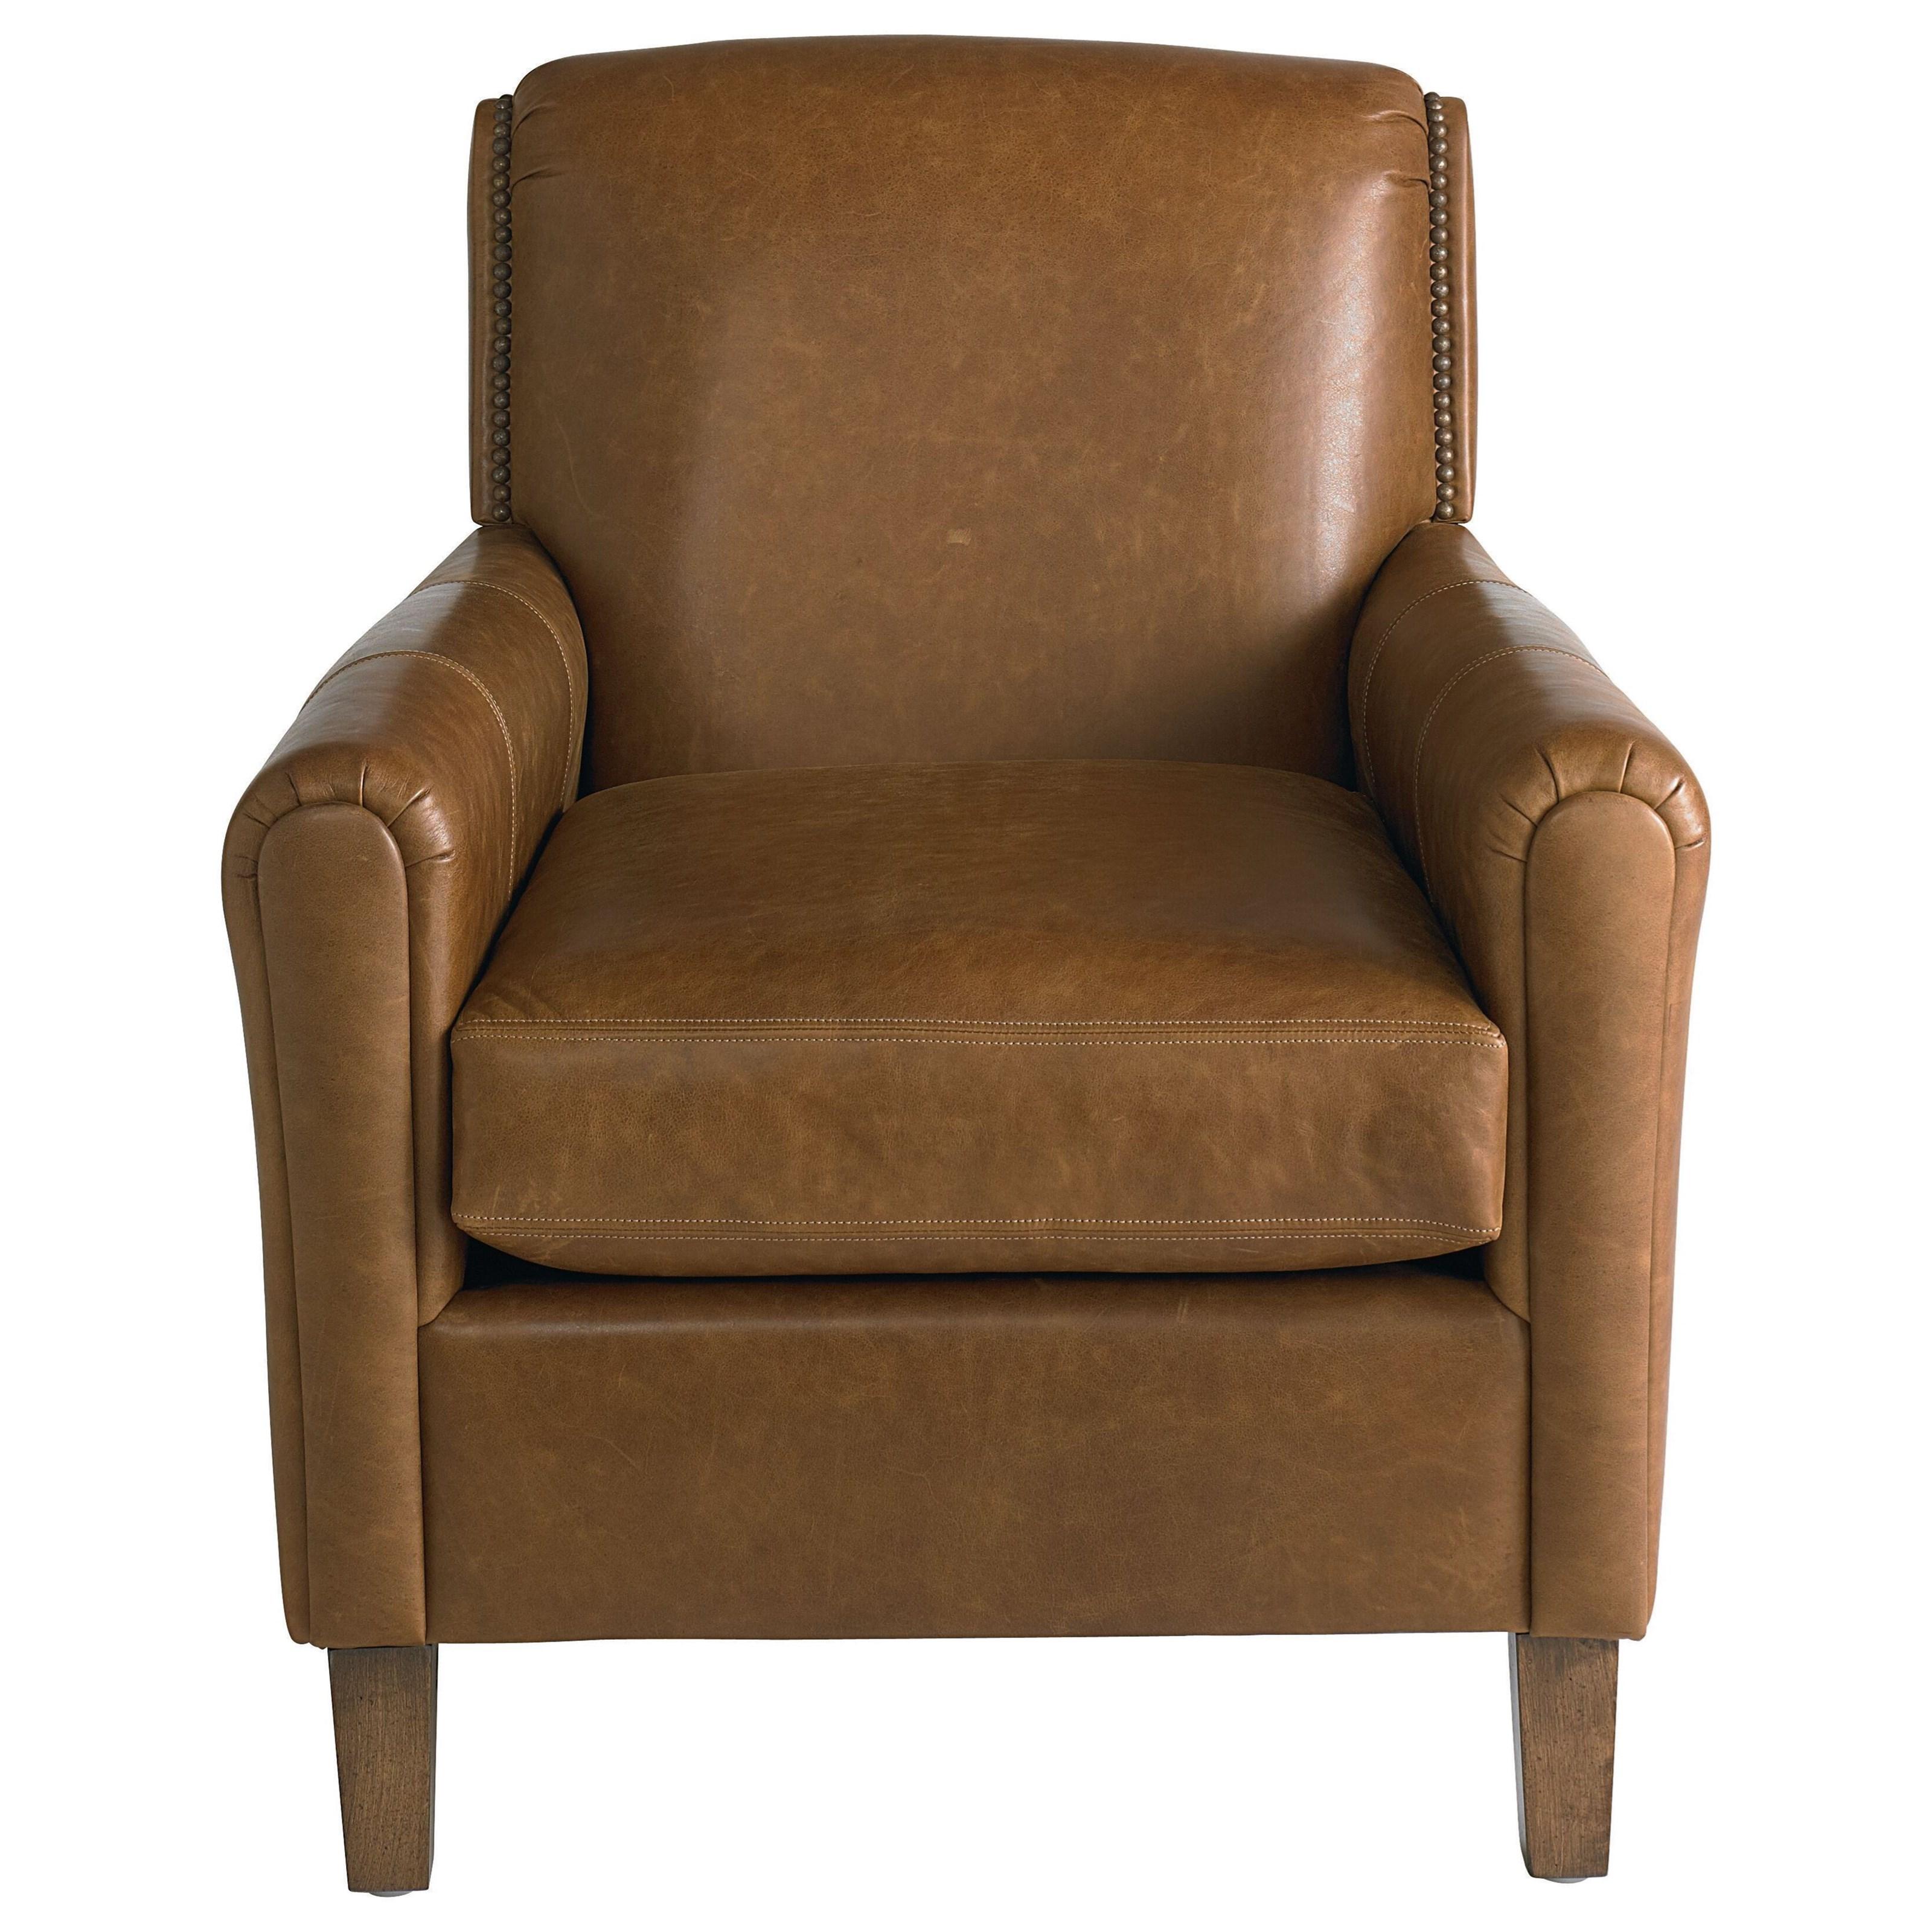 Ridgebury Accent Chair by Bassett at Bassett of Cool Springs